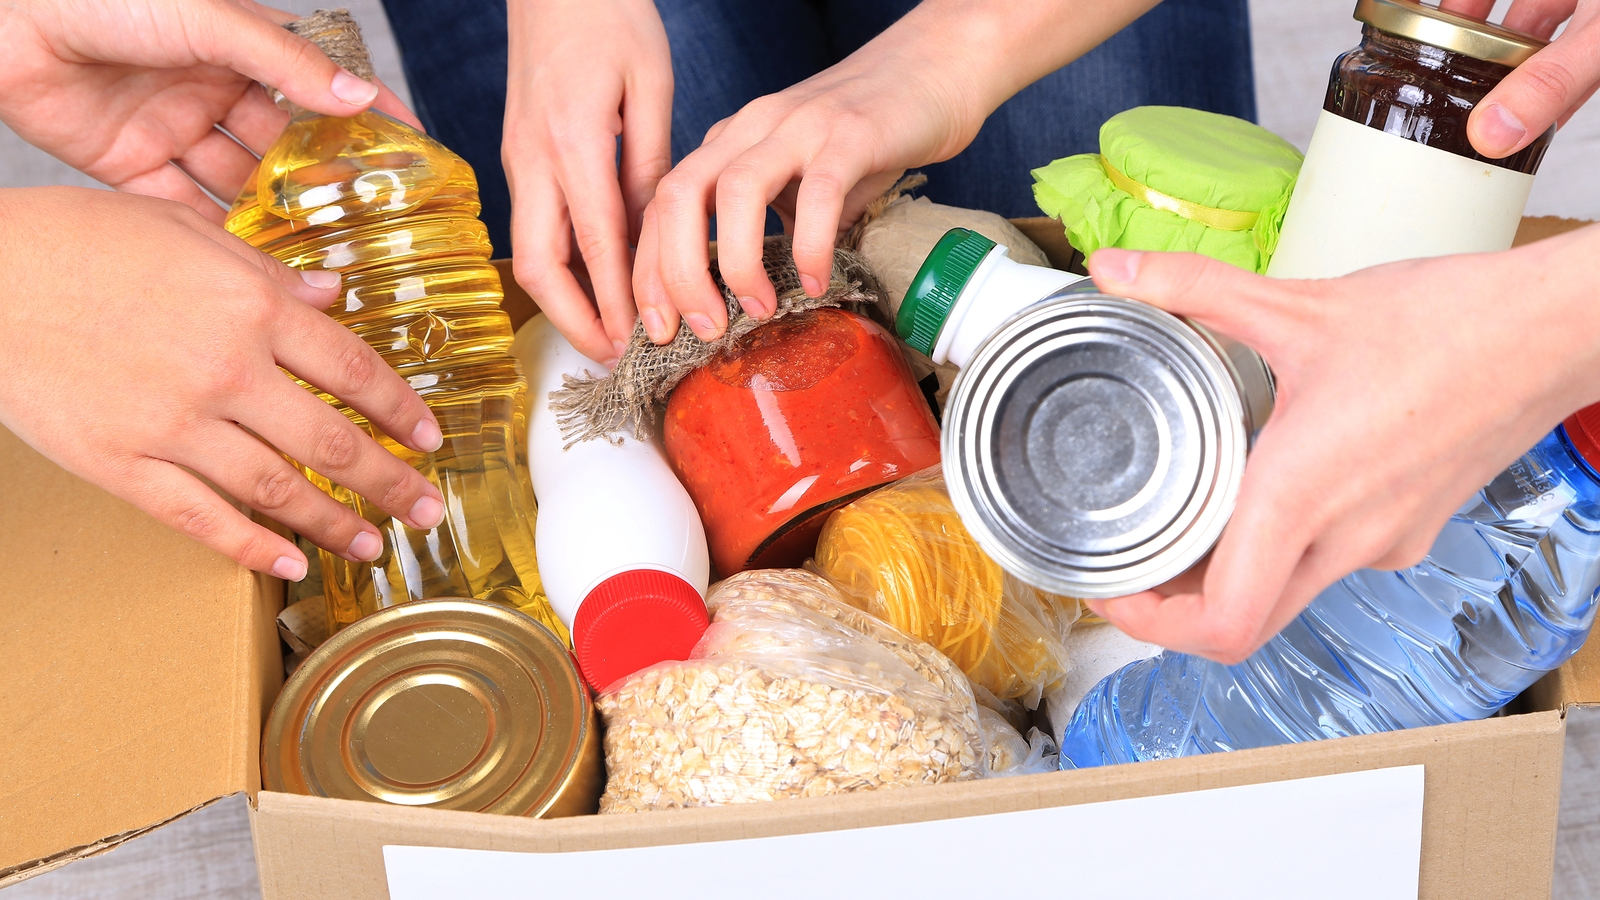 bigstock-People-makes-foodstuffs-out-of-65270653.jpg